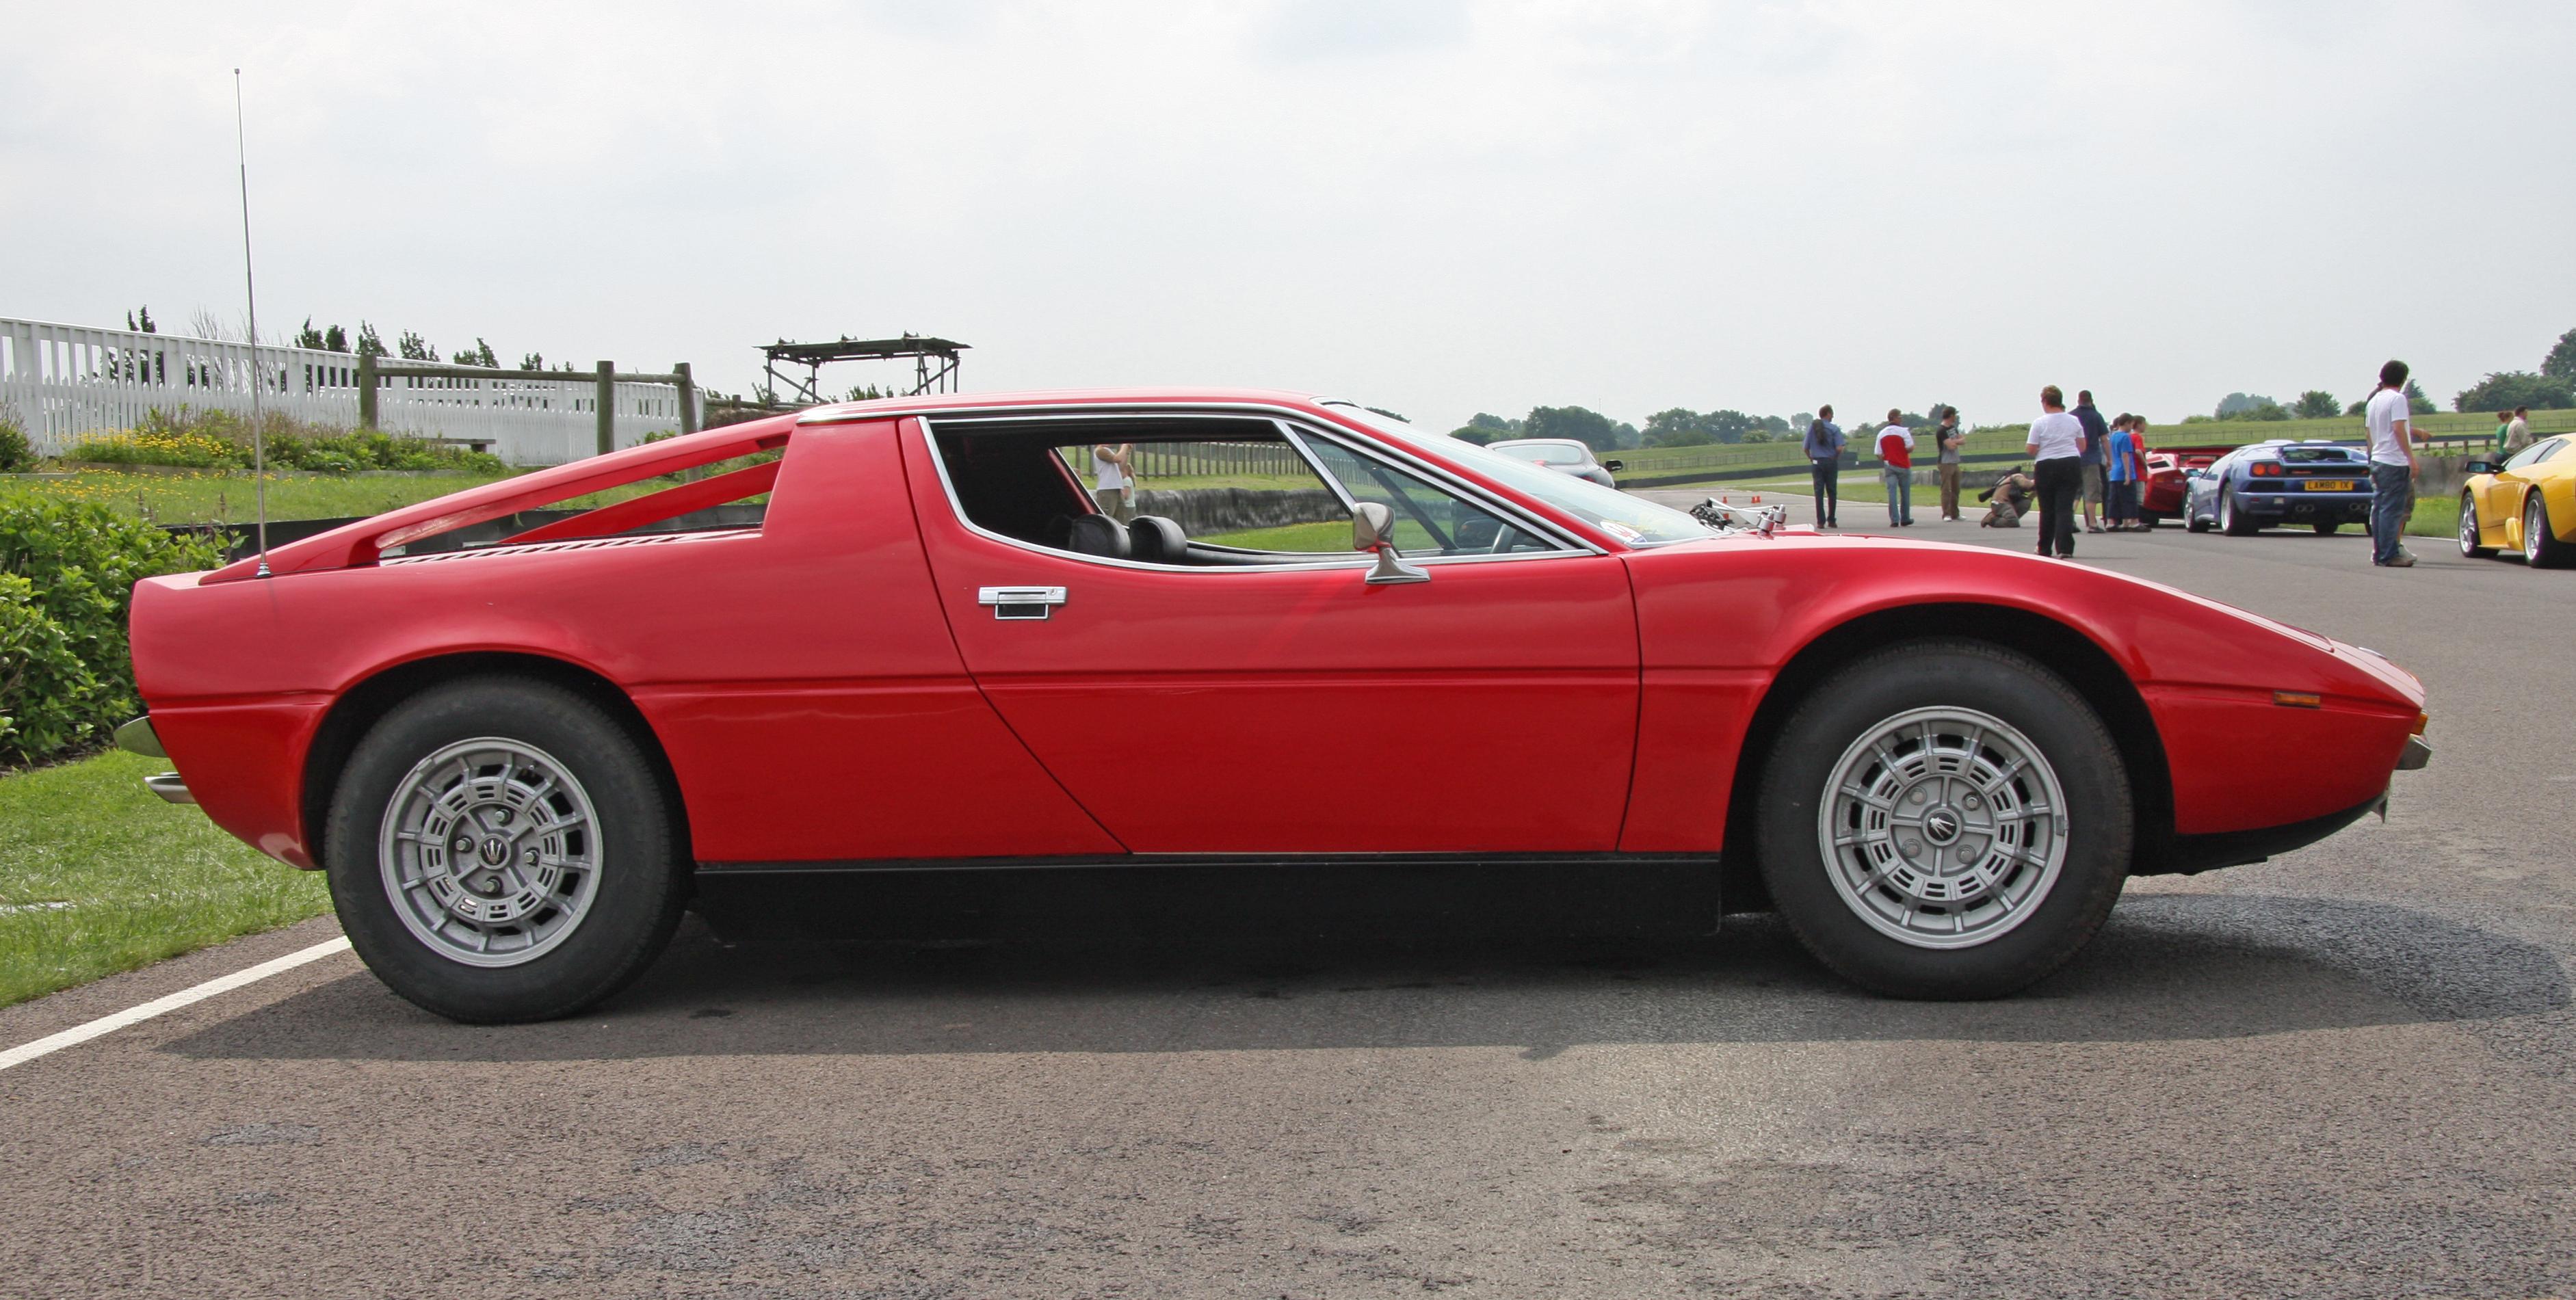 File:Maserati Merak - Flickr - exfordy (2).jpg - Wikimedia ...